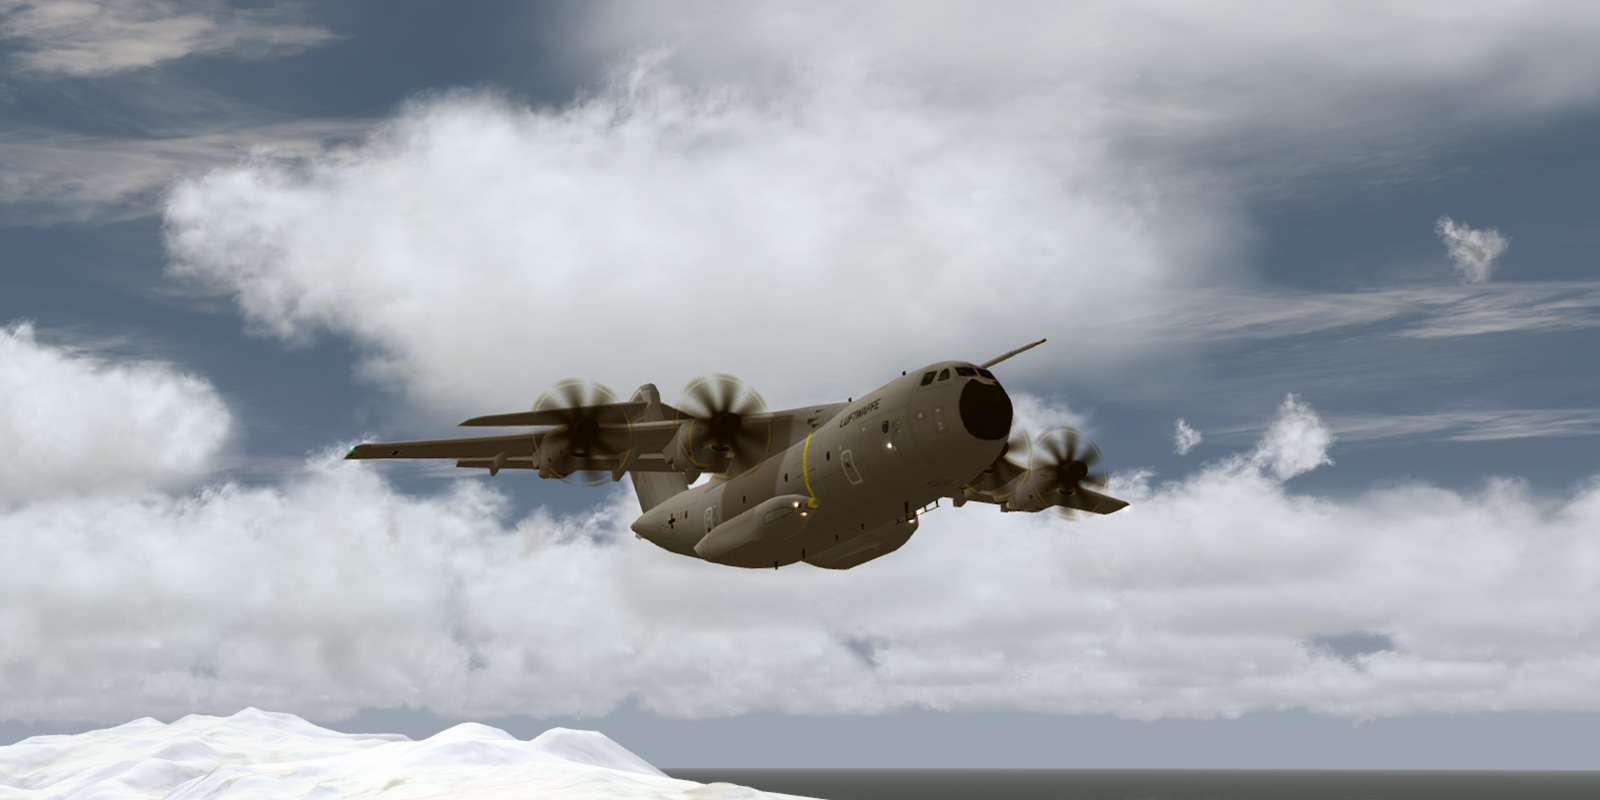 MAIW NBAI A400M Atlas Conversion (P3Dv4 Version) - Military AI Works